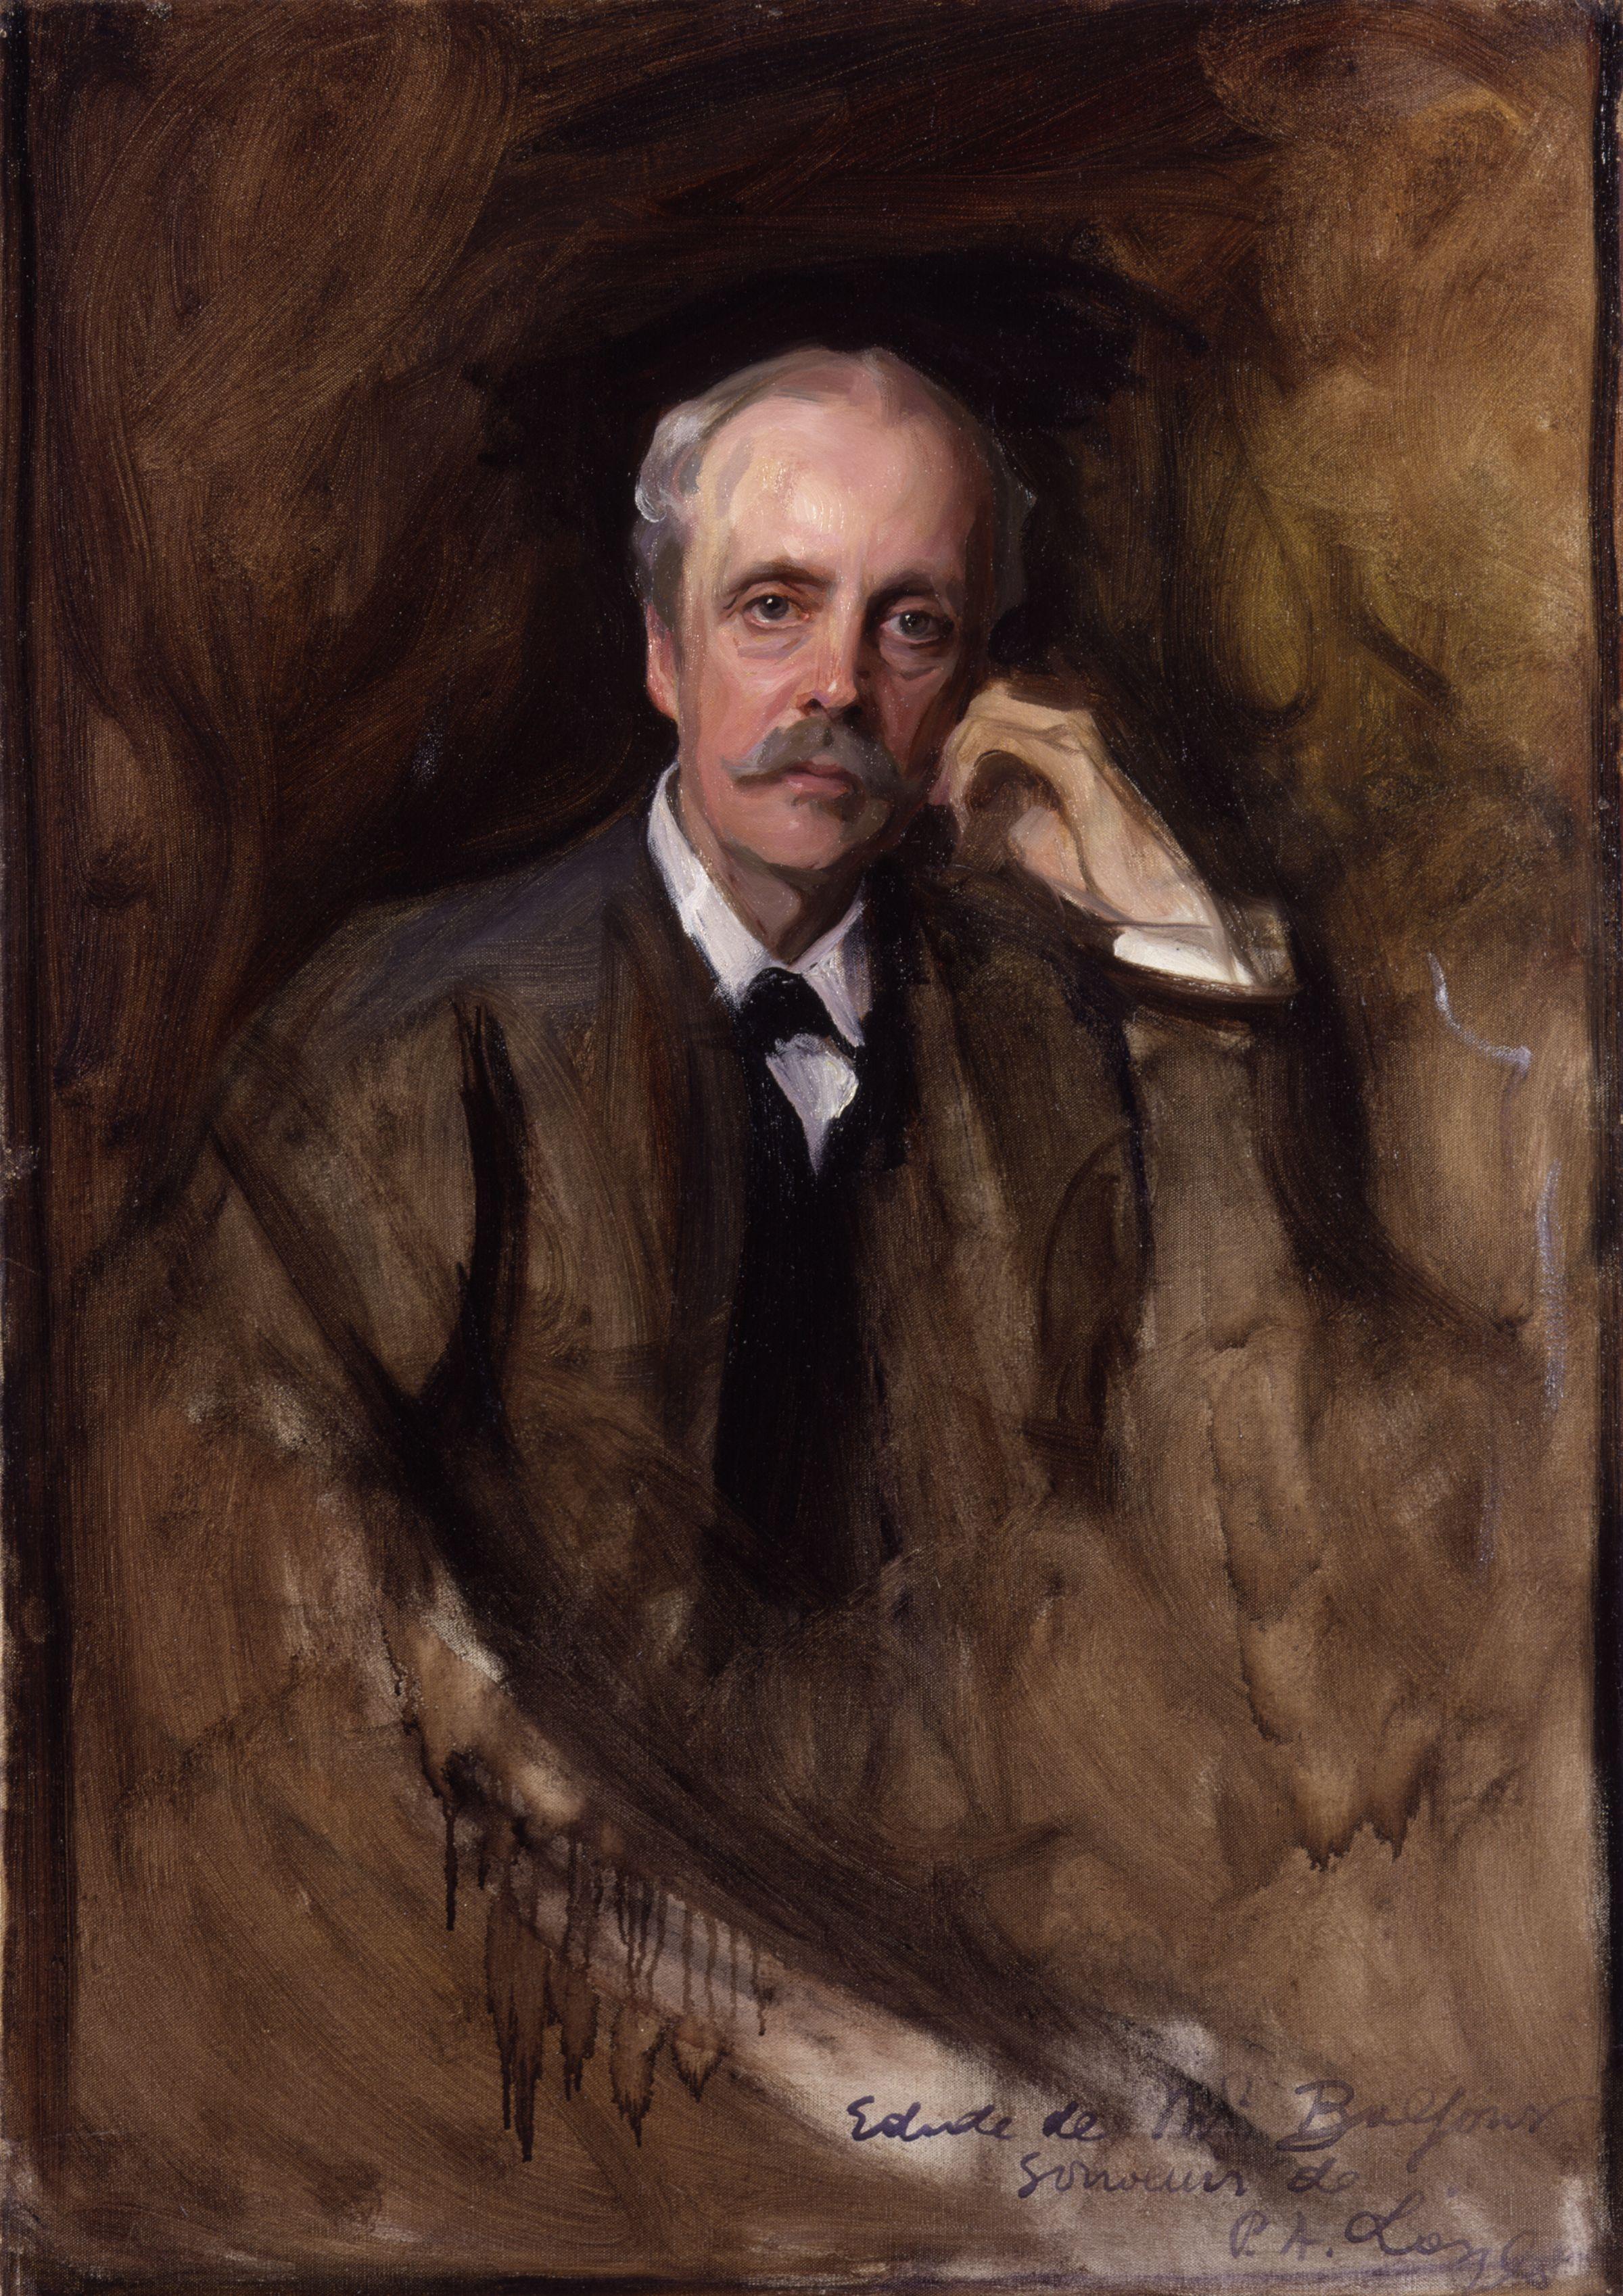 https://upload.wikimedia.org/wikipedia/commons/9/9b/Arthur_James_Balfour%2C_1st_Earl_of_Balfour_by_Philip_Alexius_de_L%C3%A1szl%C3%B3.jpg